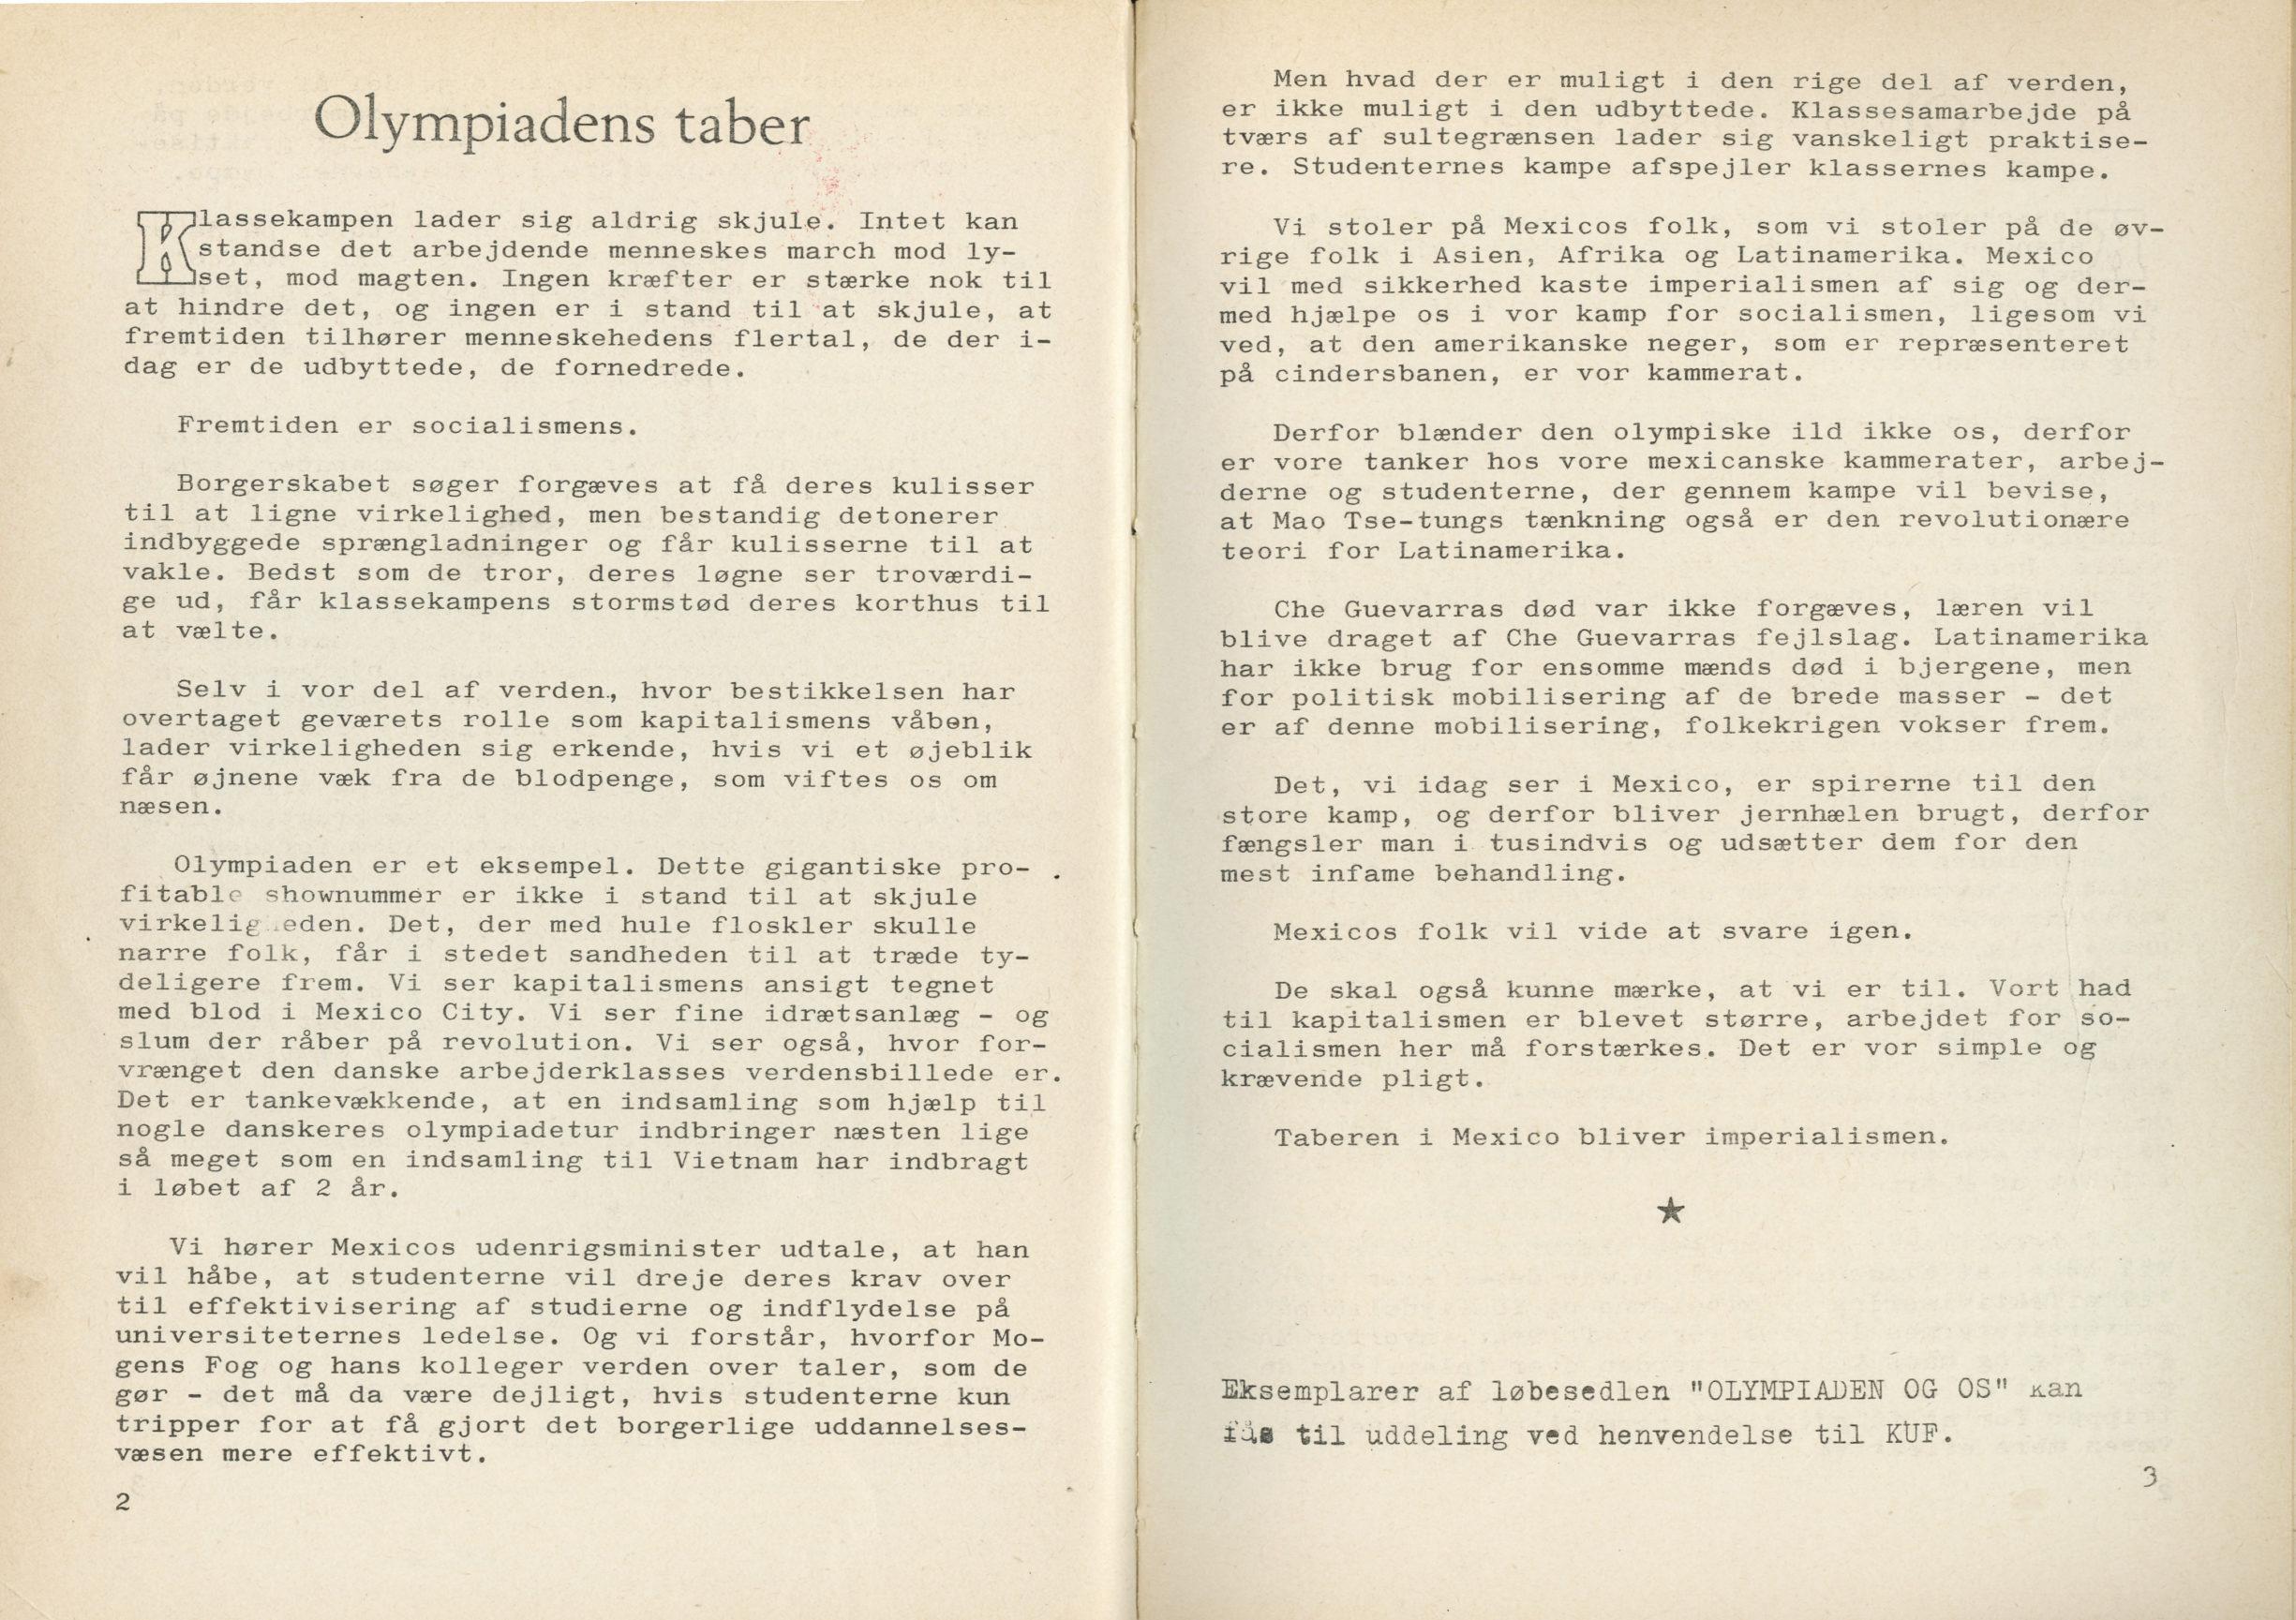 Ungkommunisten1968 nr. 10 s. 2-3.